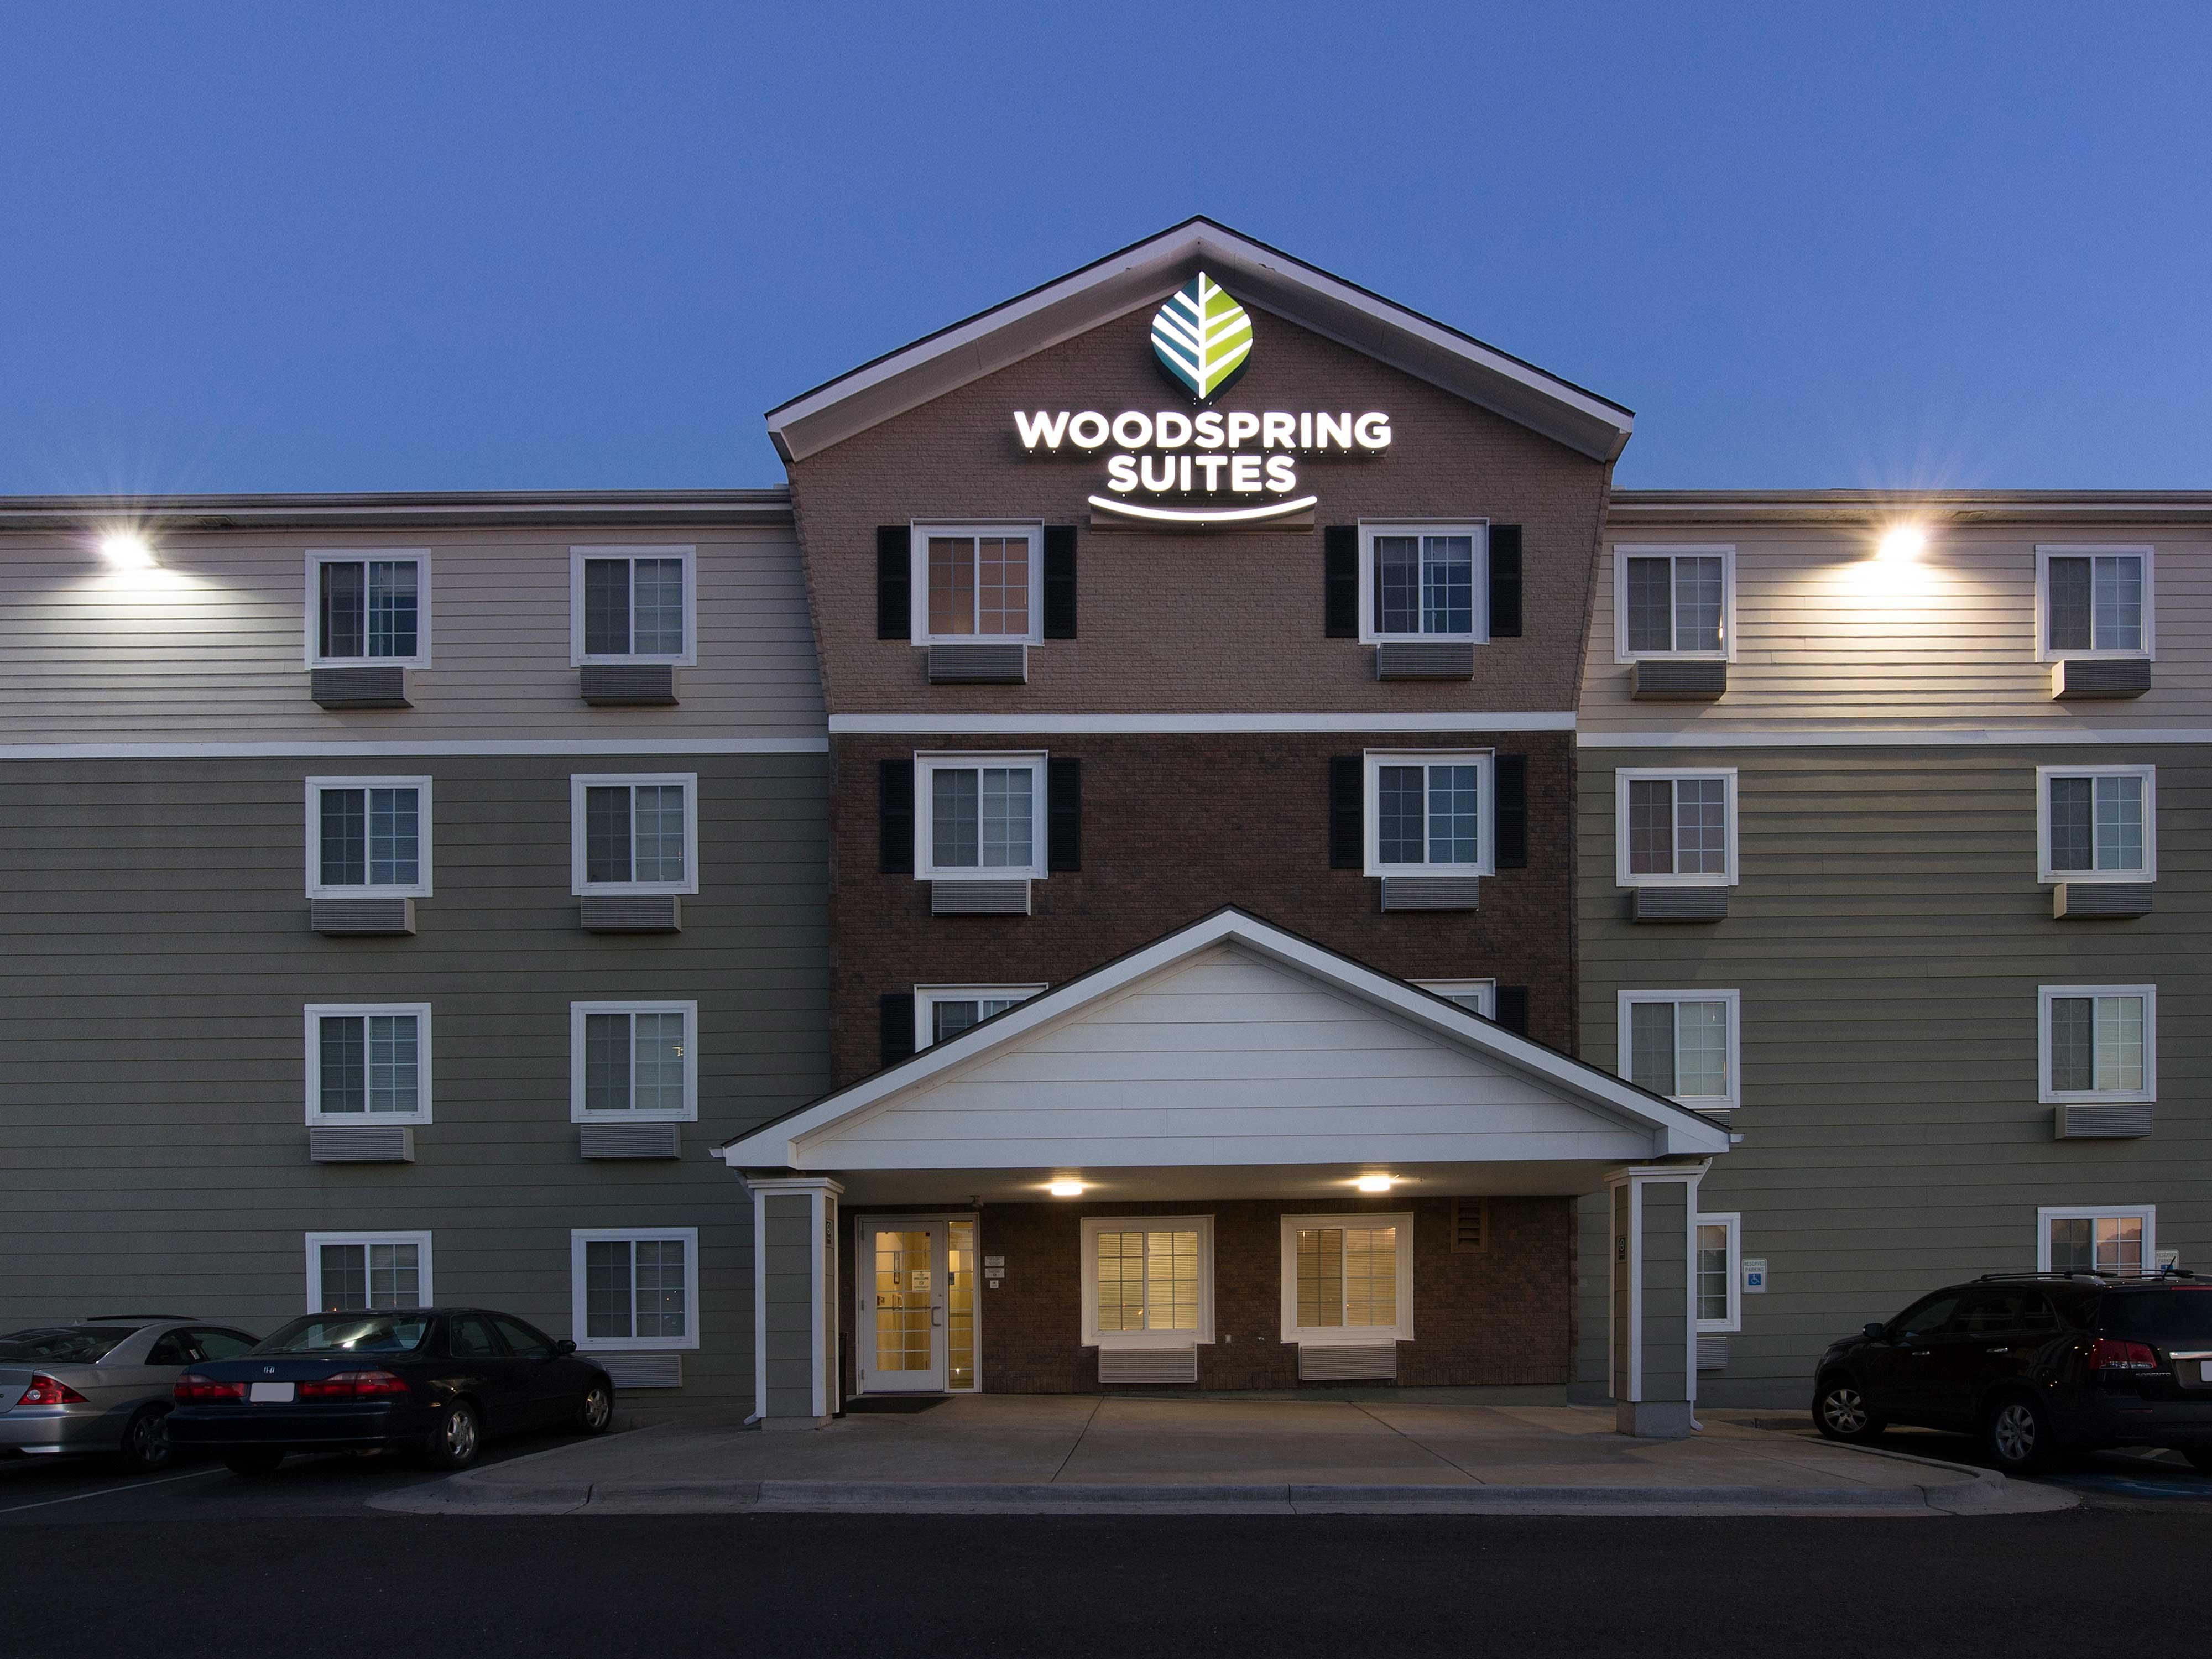 WoodSpring Suites Kansas City Mission image 5